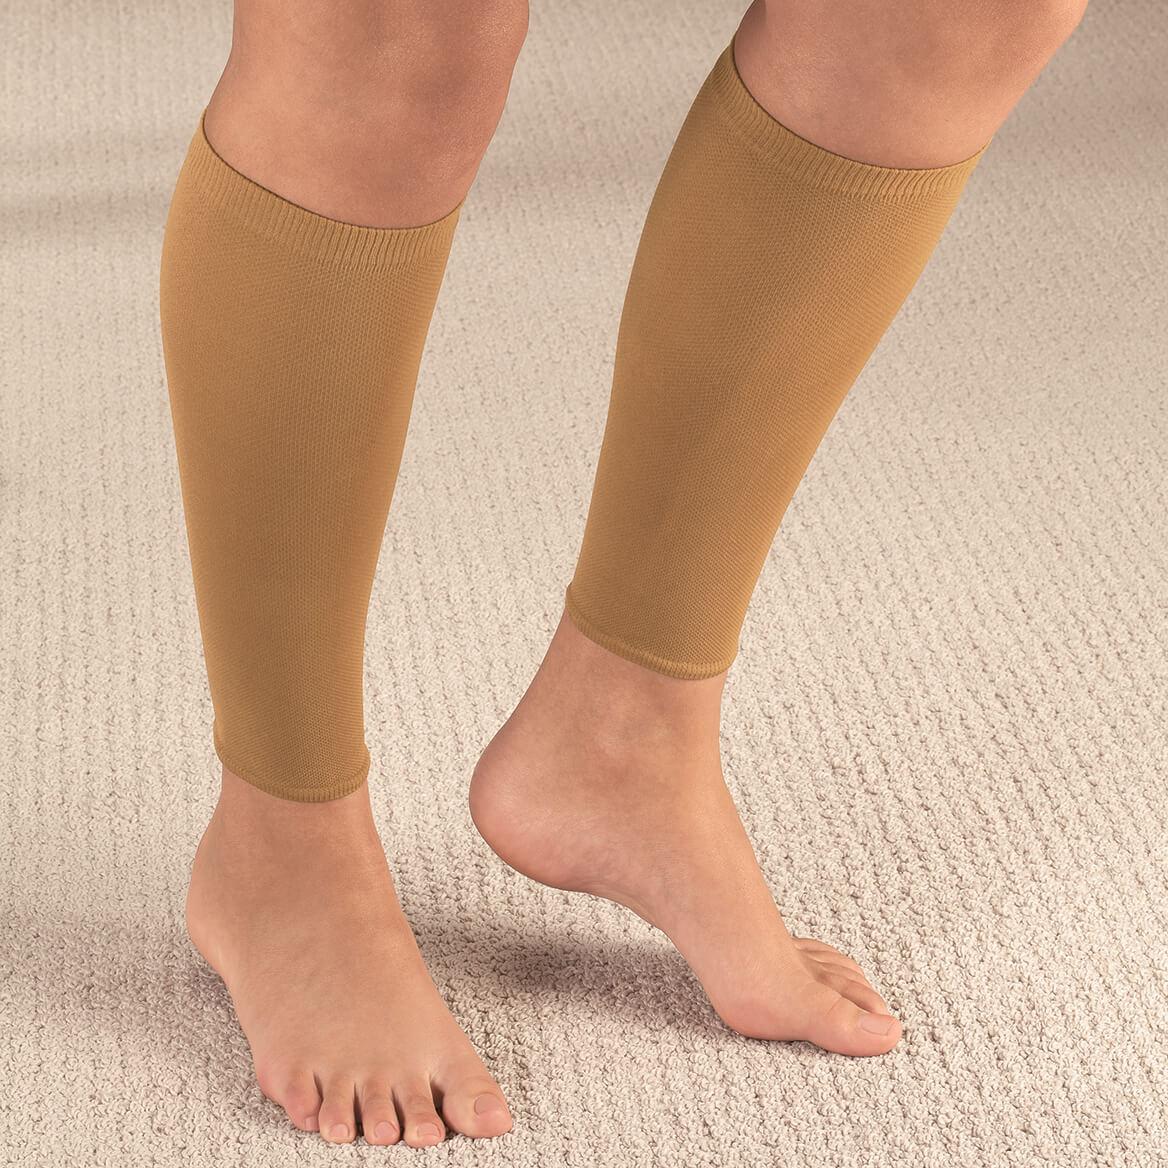 Calf Compression Sleeves 20-30mmHg, 1 Pair-347674